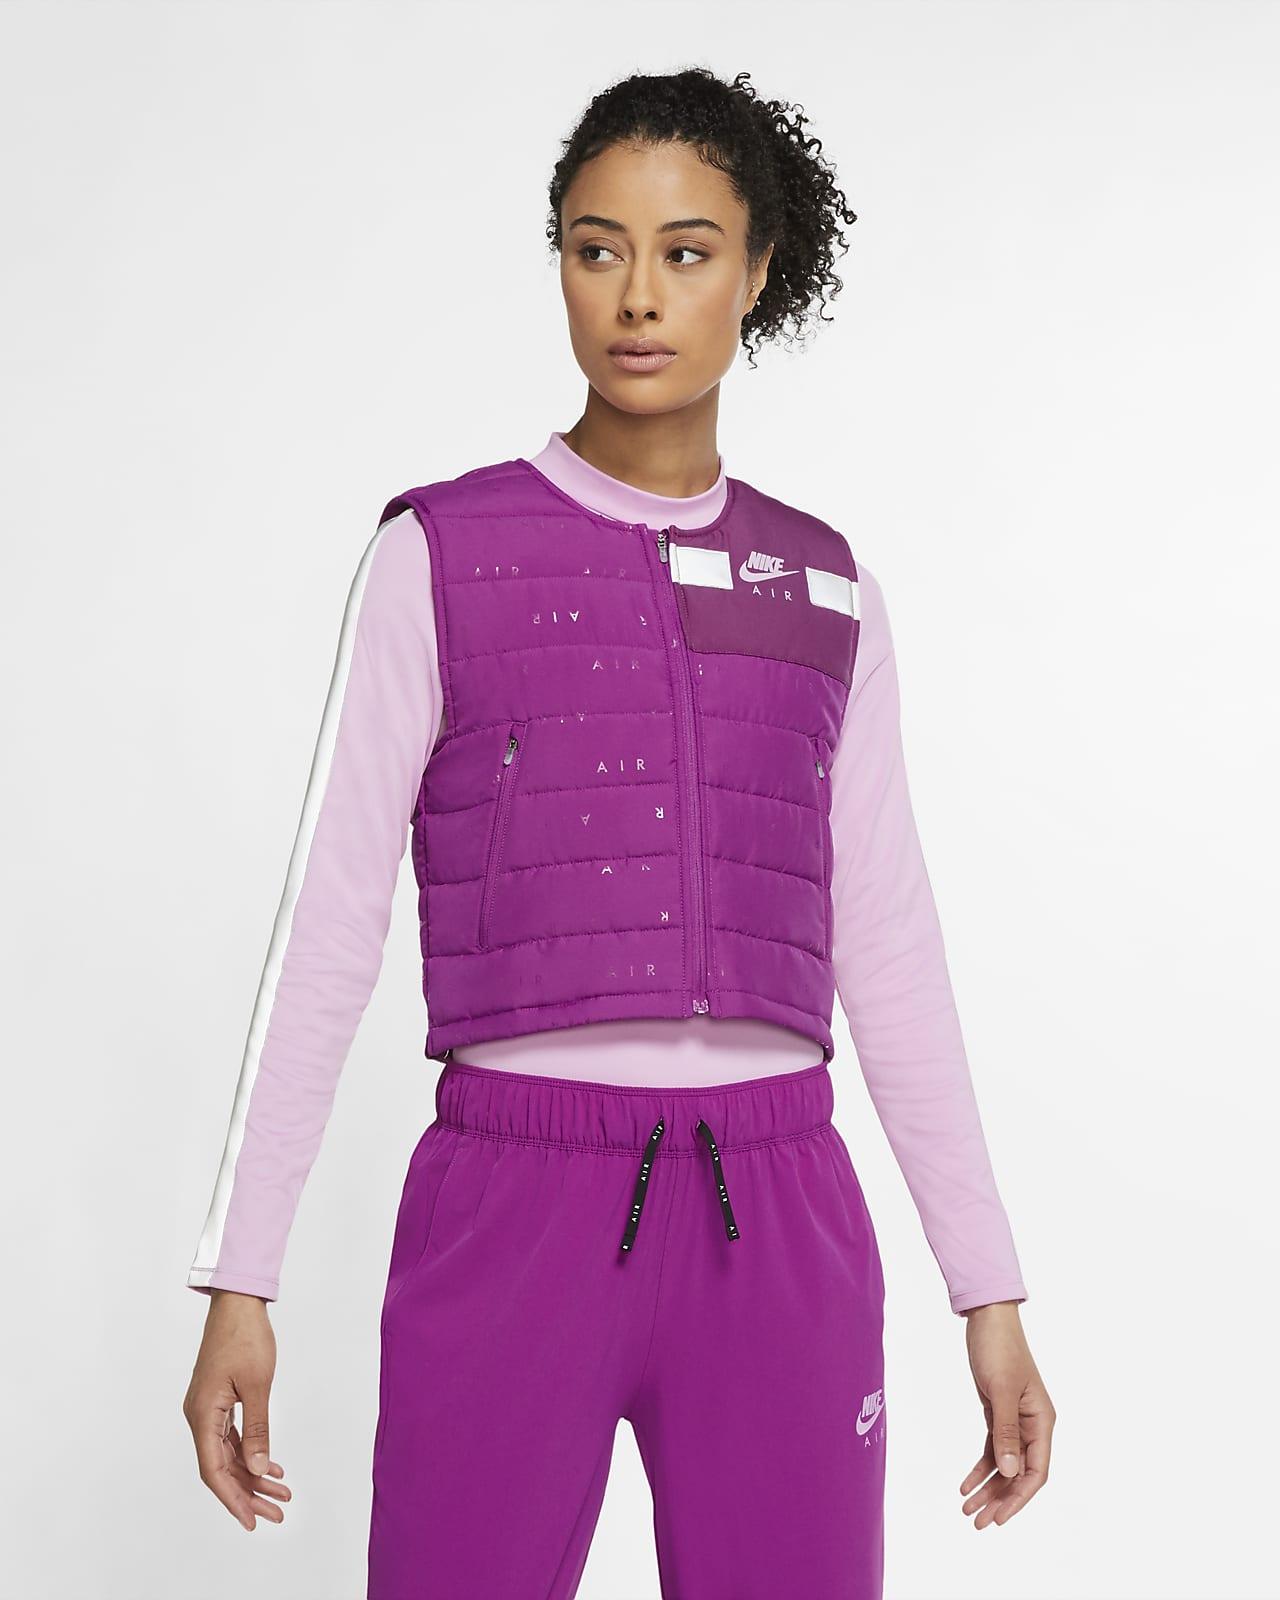 Chaleco de running para mujer Nike Air